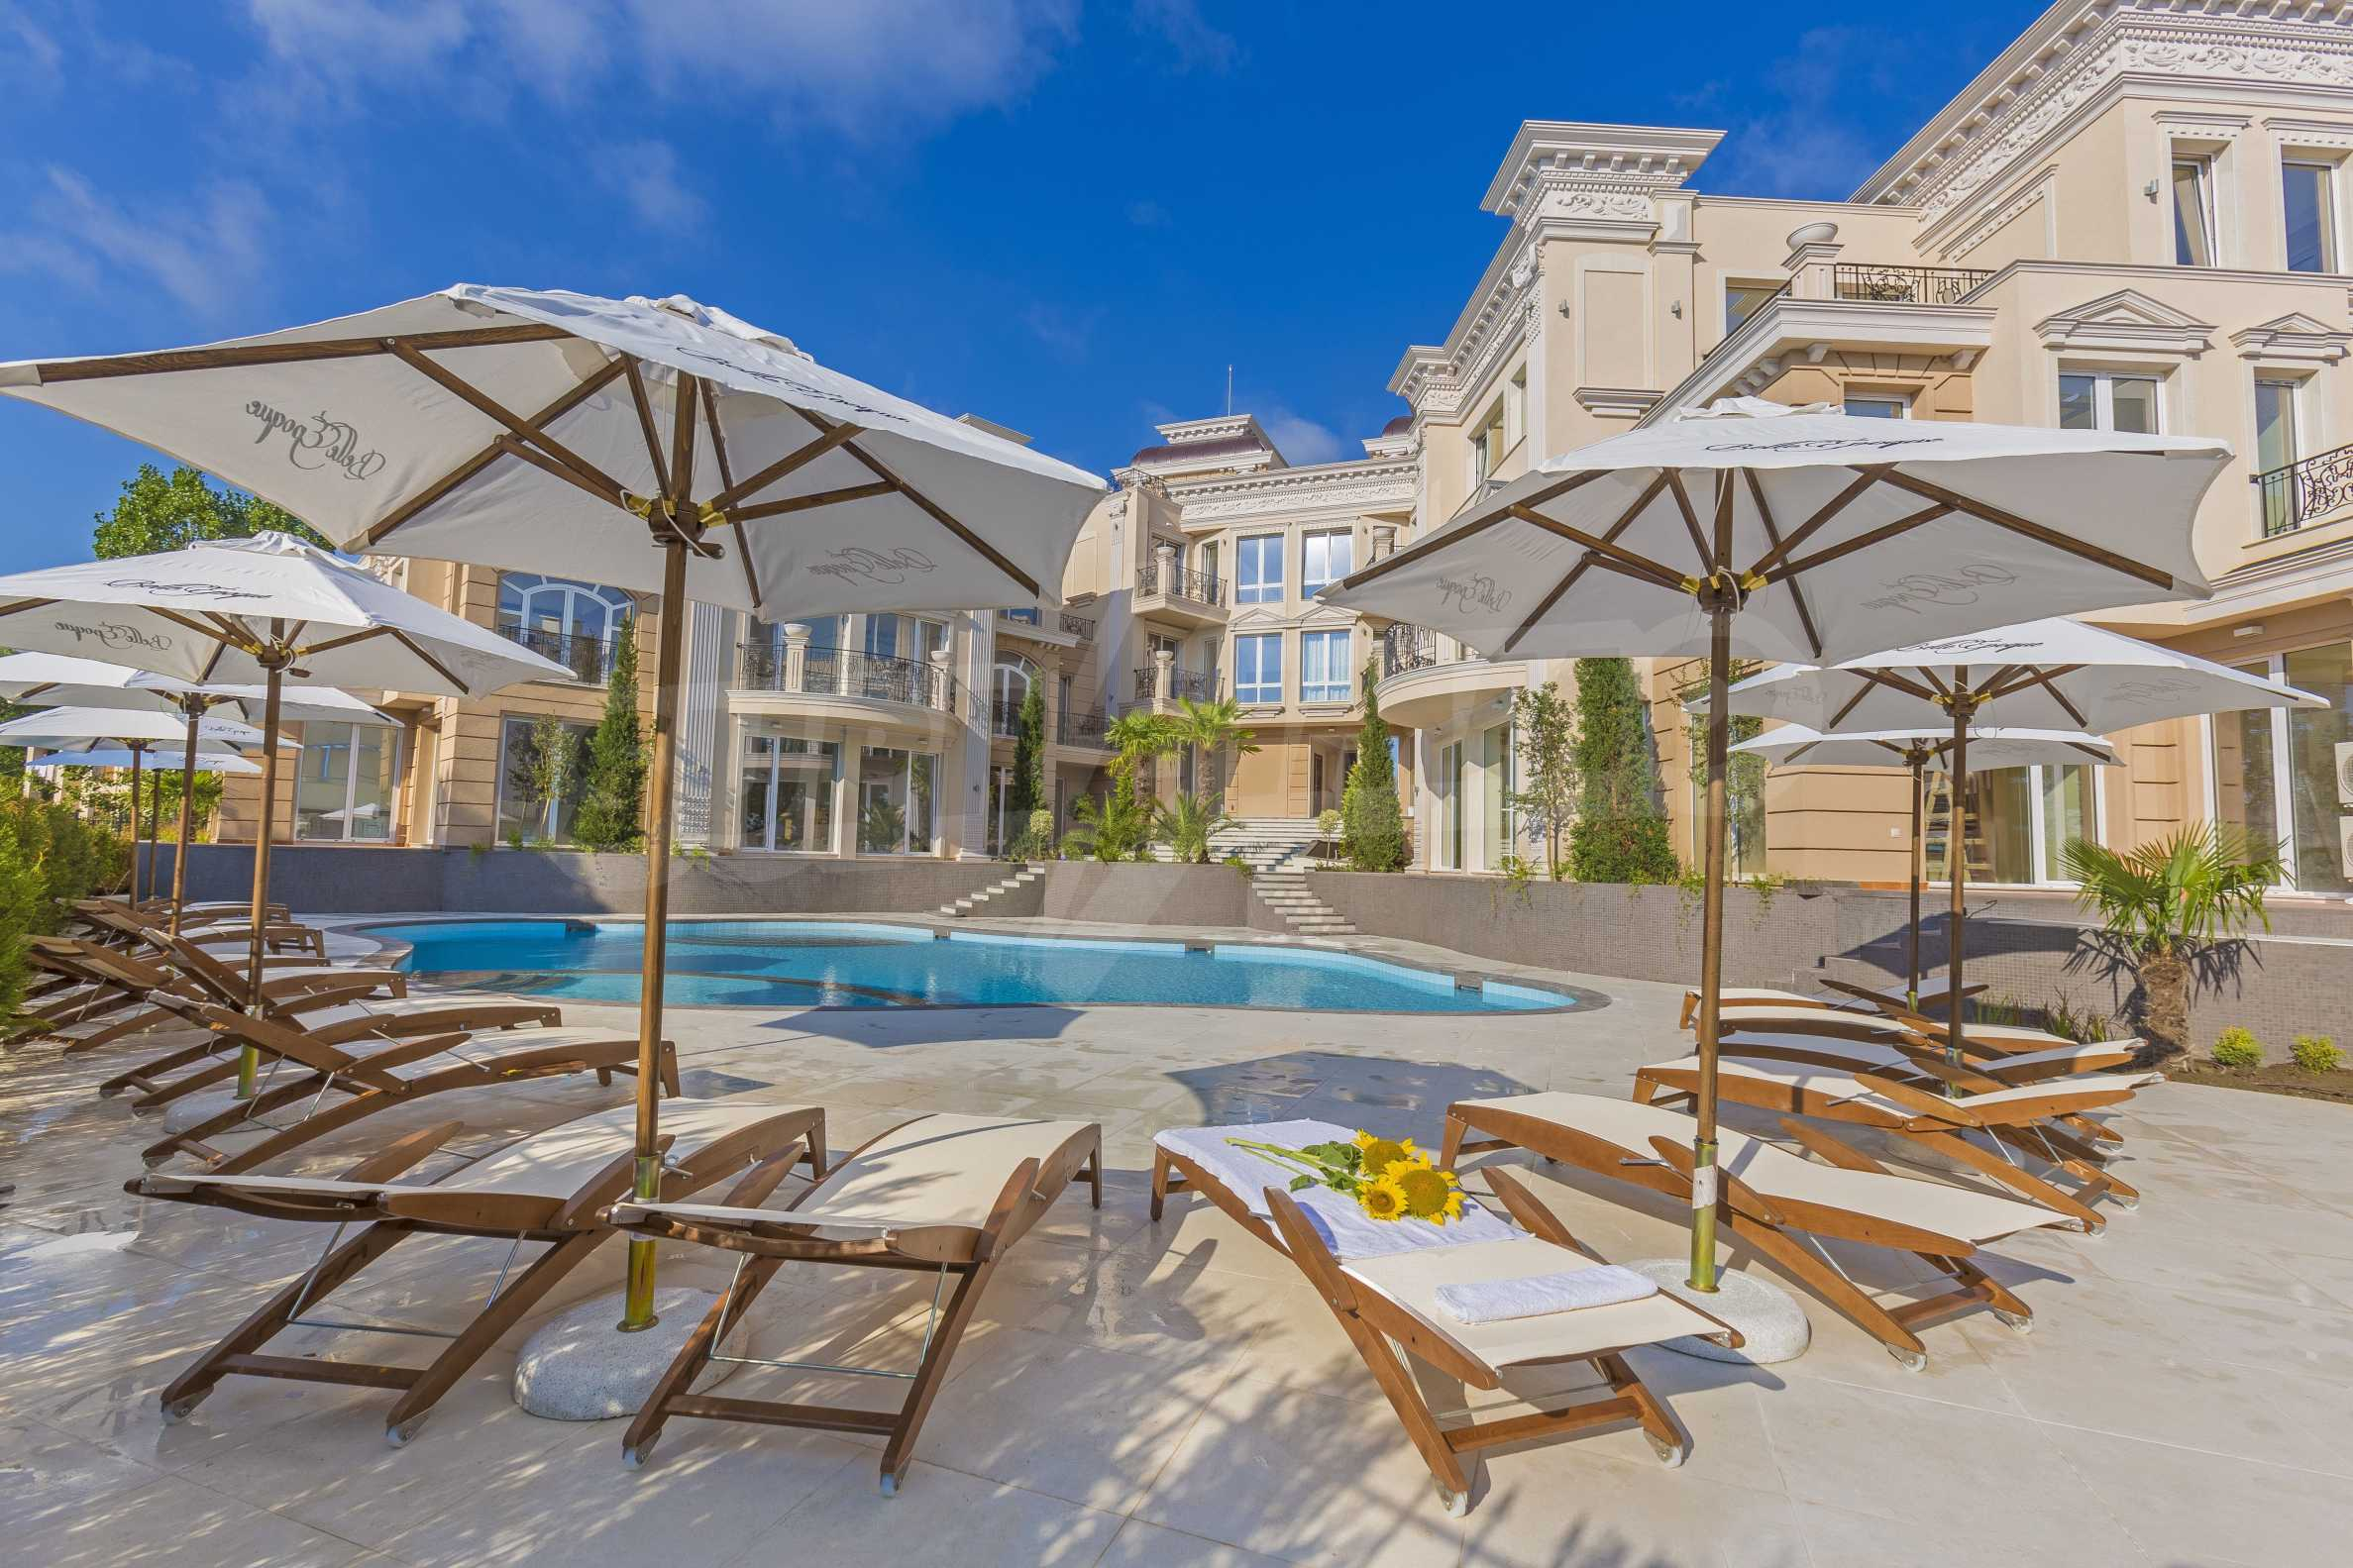 Първокласен двустаен апартамент в Belle Époque Beach Residence (ап. №A 206) 19